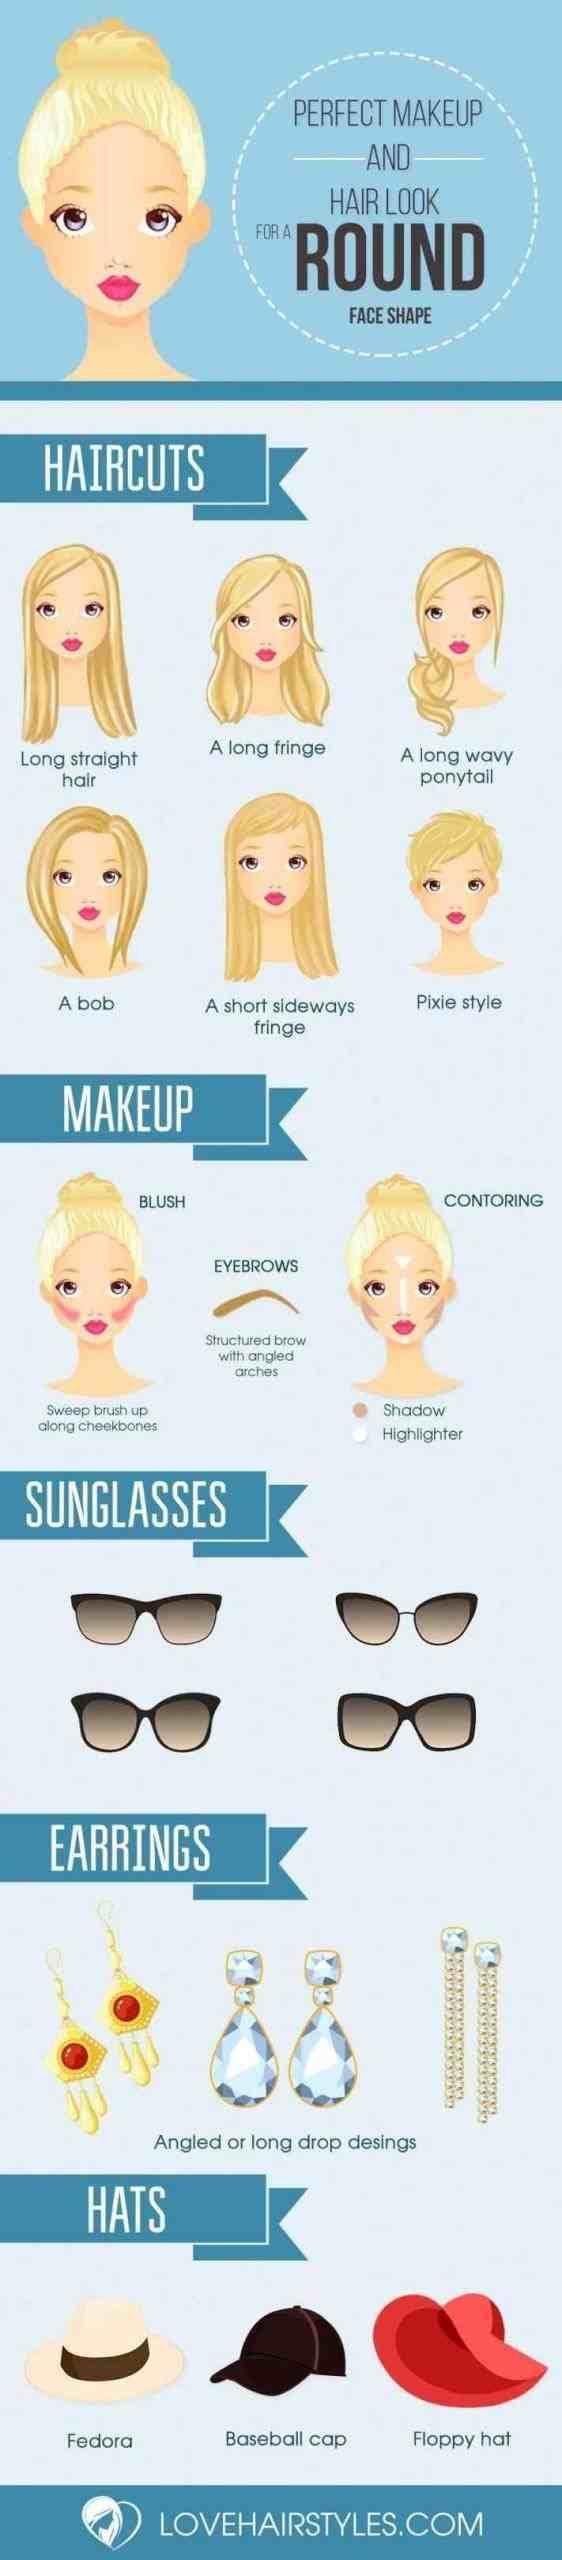 english adworkspk amazing Hair Tips In English and natural hair care tips in english adworkspk health beauty tumblr genuine skin health.jpg